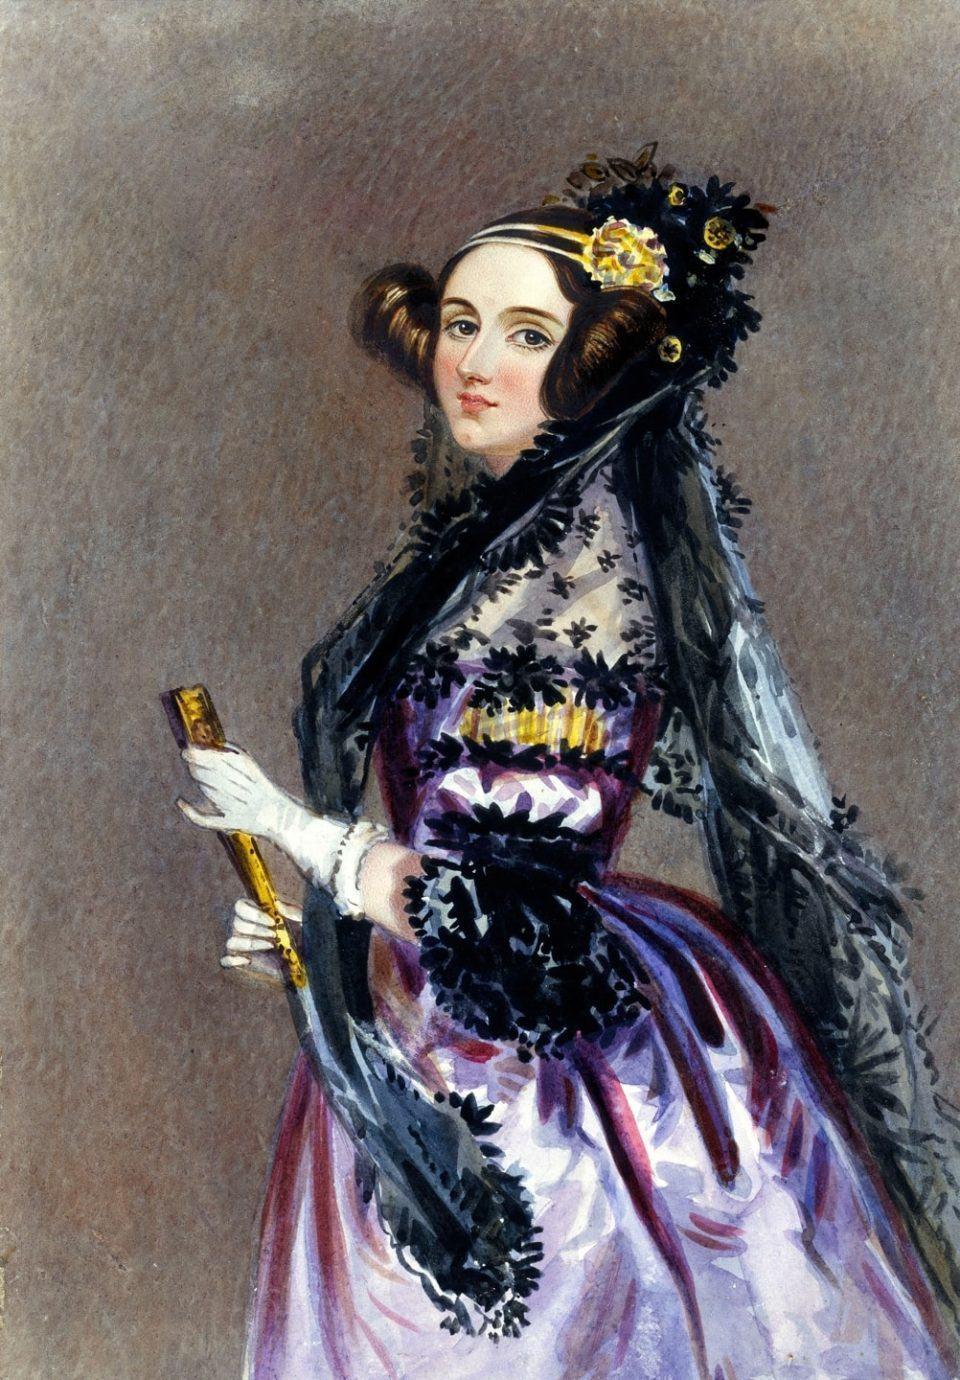 Pintura de Ada Lovelace.